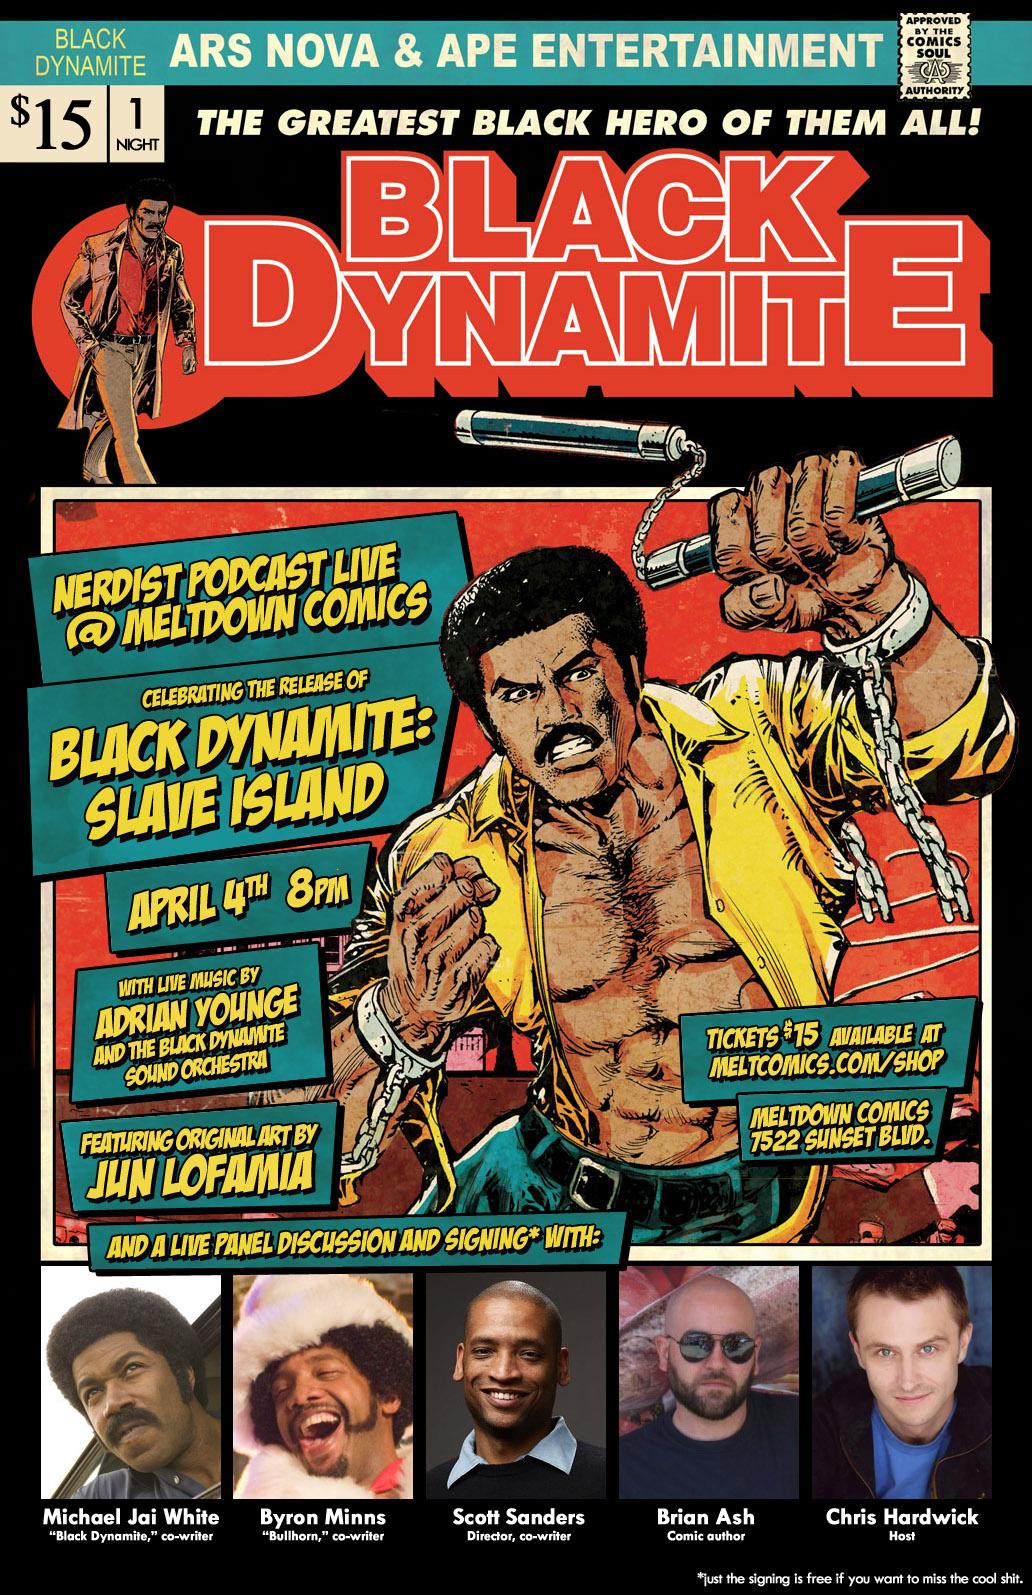 of BLACK DYNAMITE: SLAVE